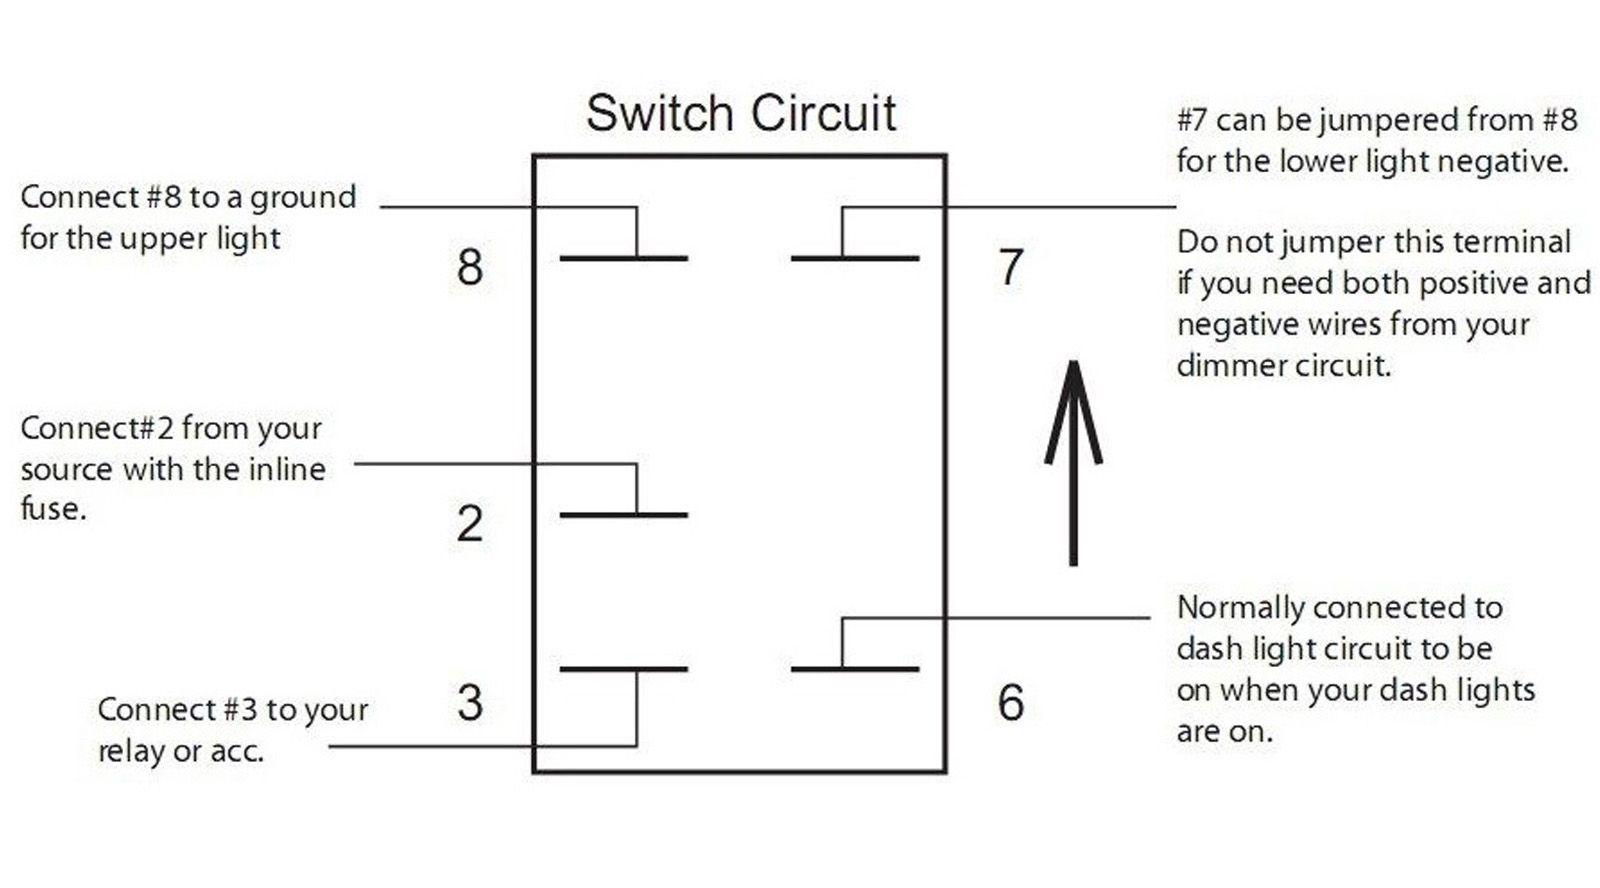 arb switch wiring diagram data schema exp arb carling switch wiring diagram arb switch diagram wiring [ 1600 x 888 Pixel ]